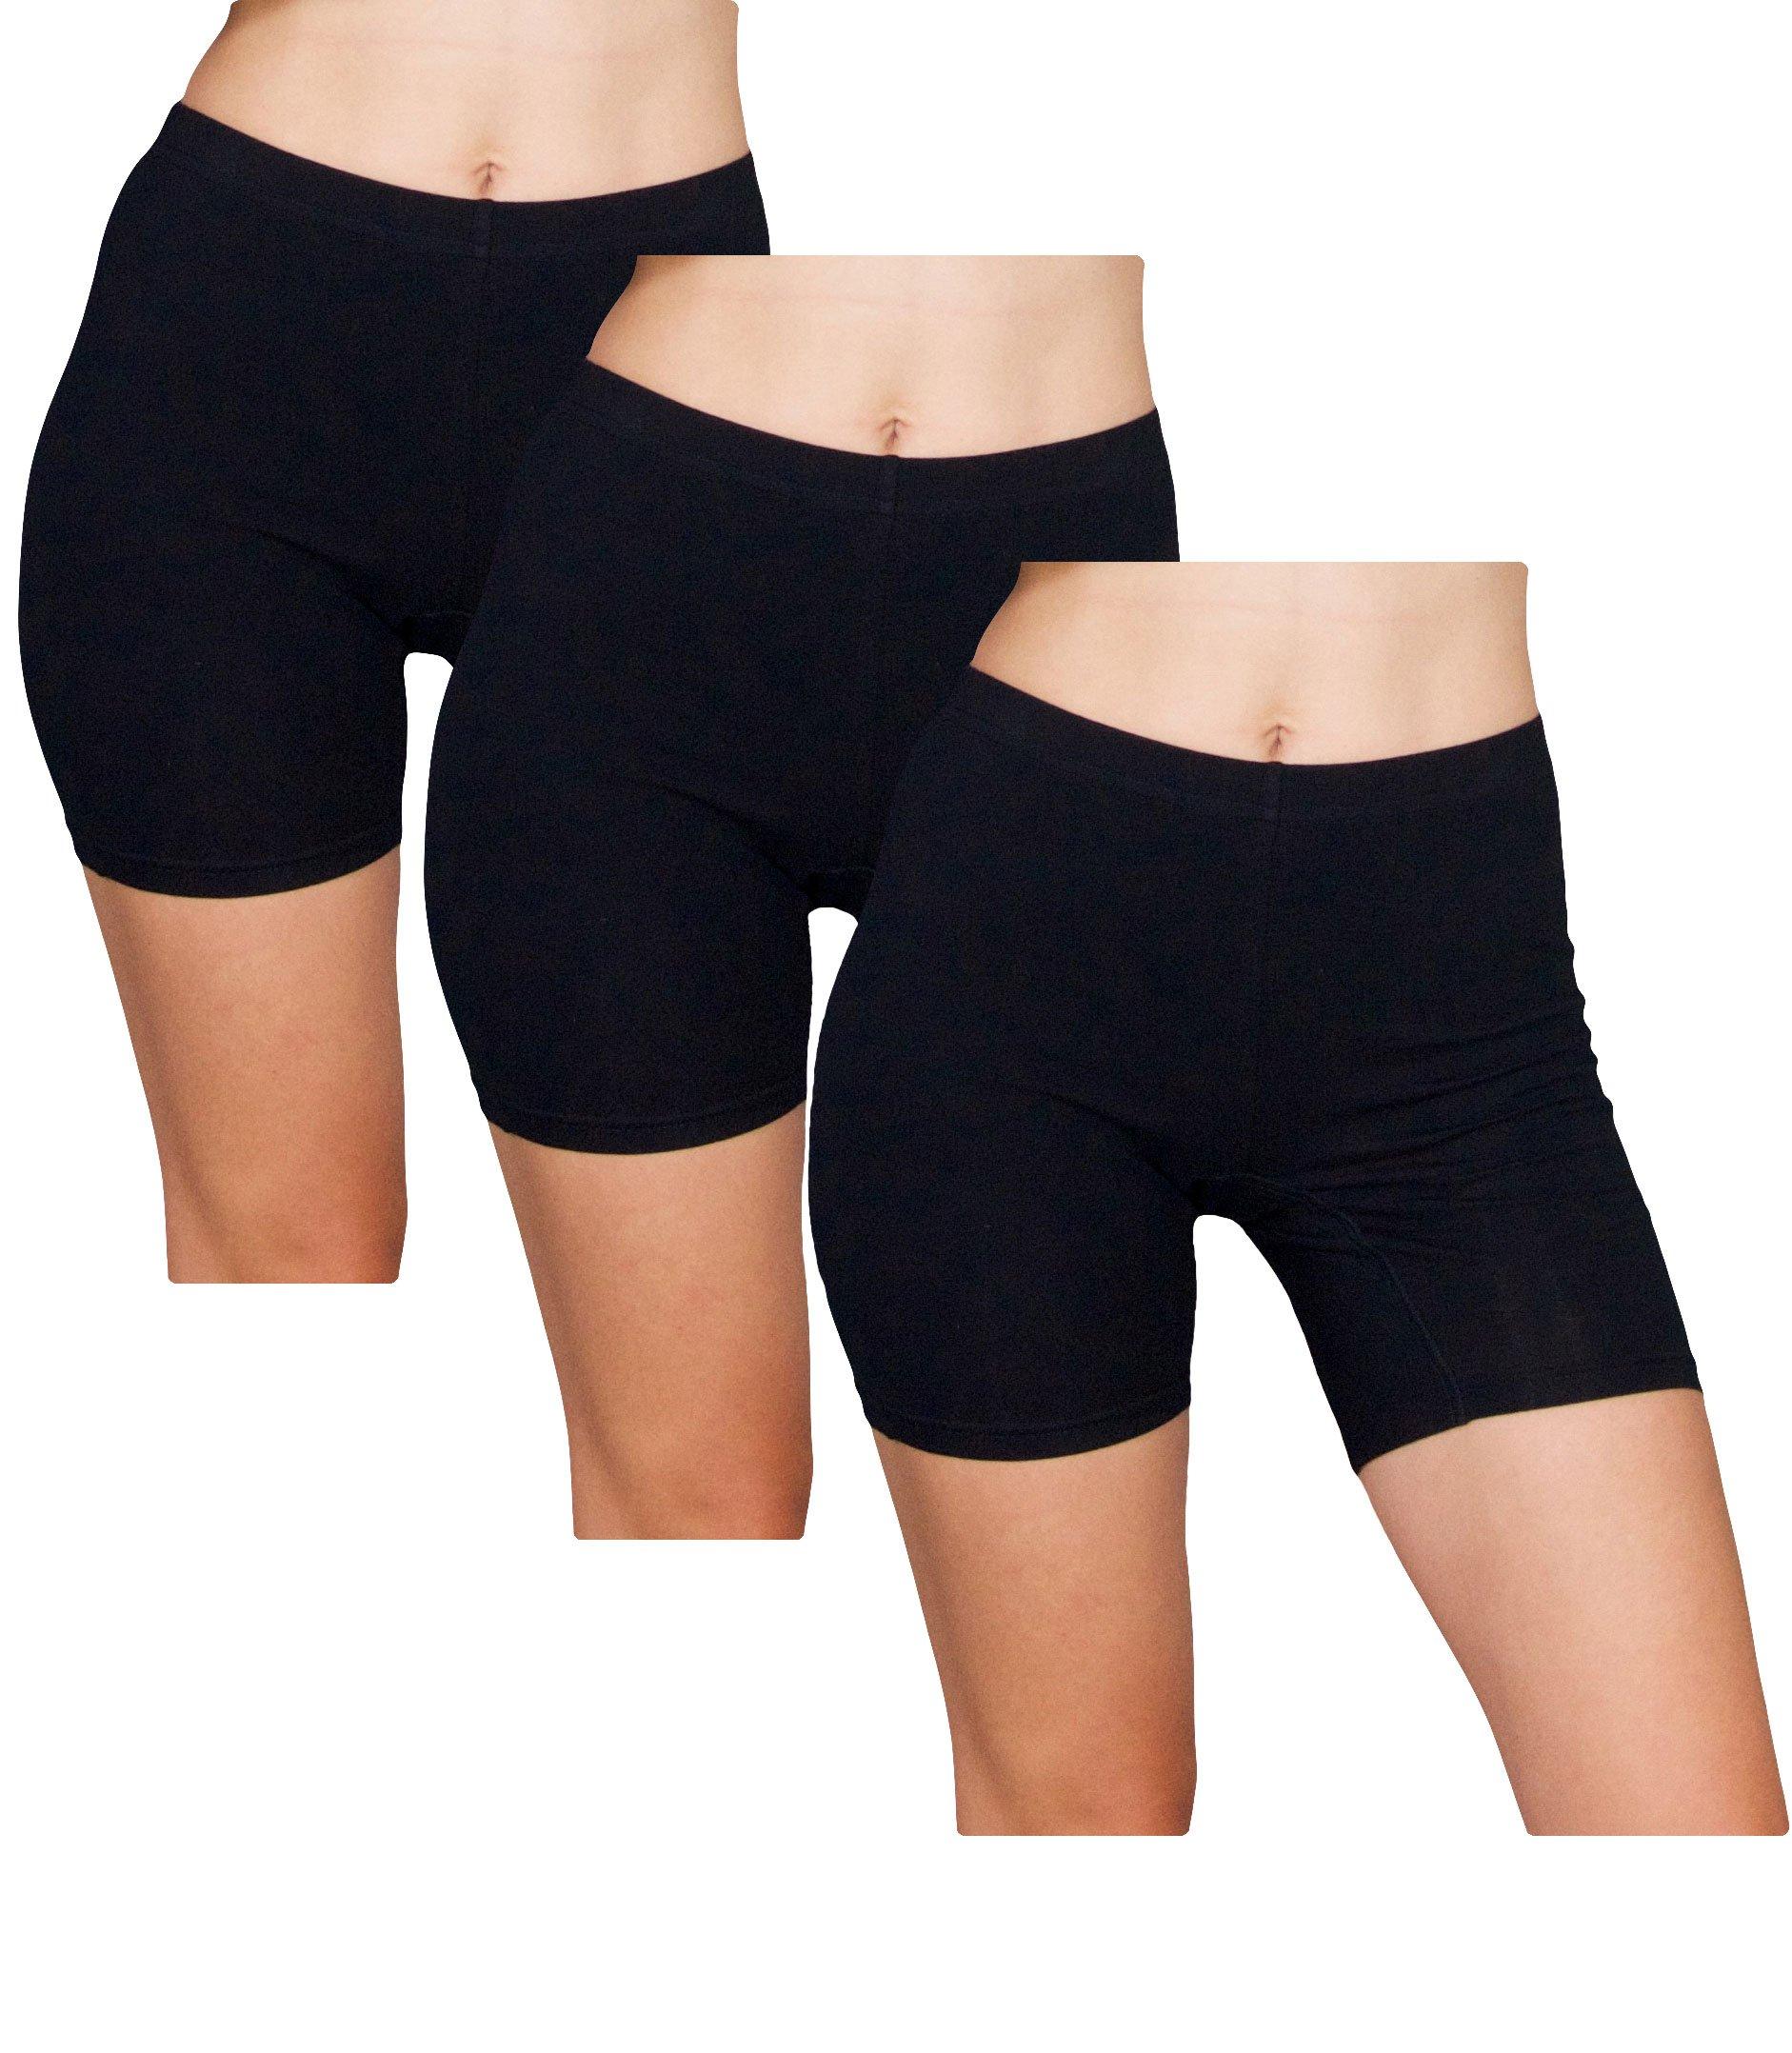 Amazon.com: Skylety 3 Pieces Anti-Chafing Modal Panties